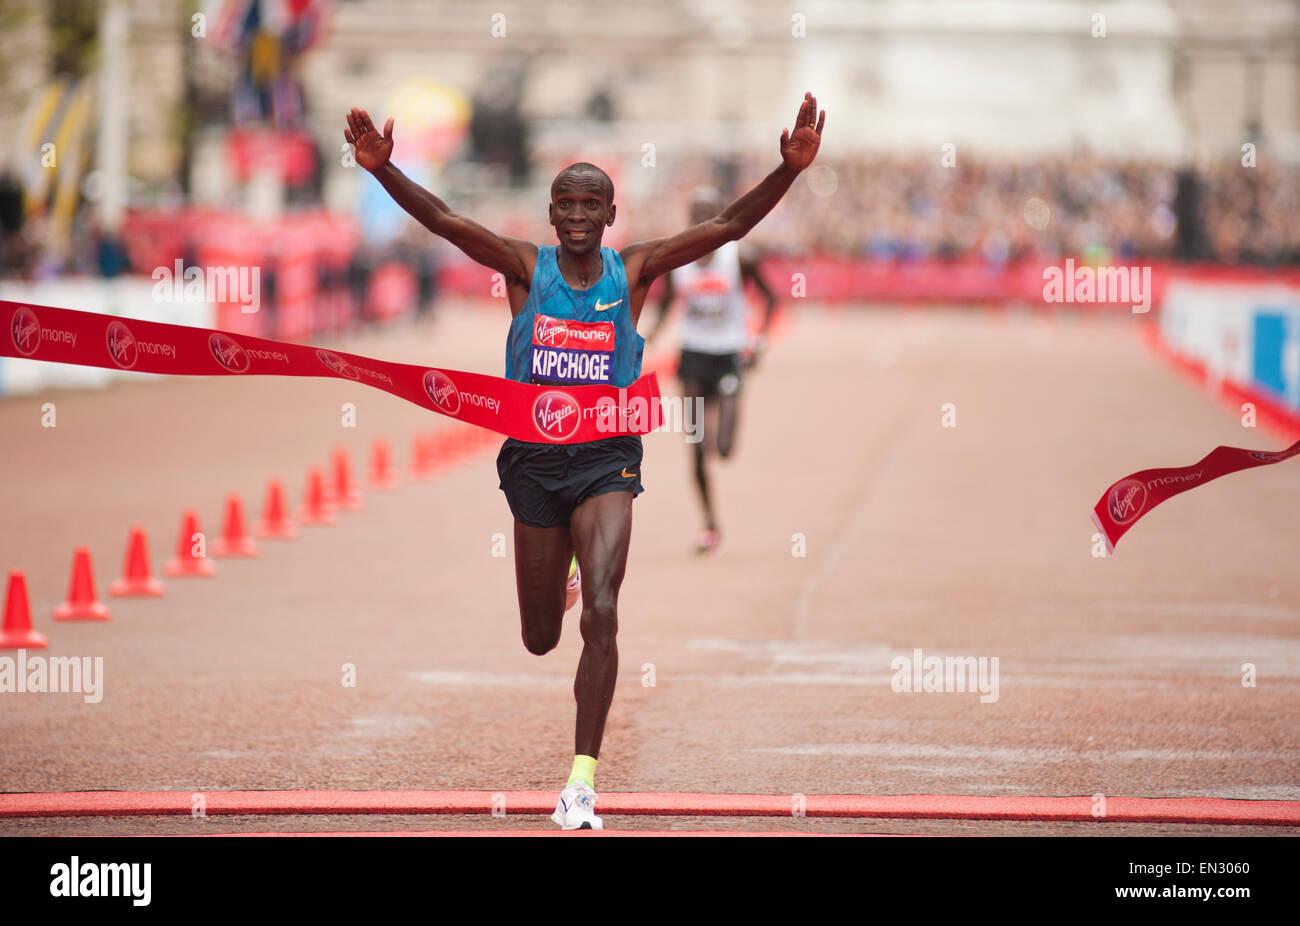 Eliud Kipchoge de Kenia gana el Maratón de Londres Virgin Money 2015 en 02:04:42 con Wilson Kipsang de Kenya Imagen De Stock